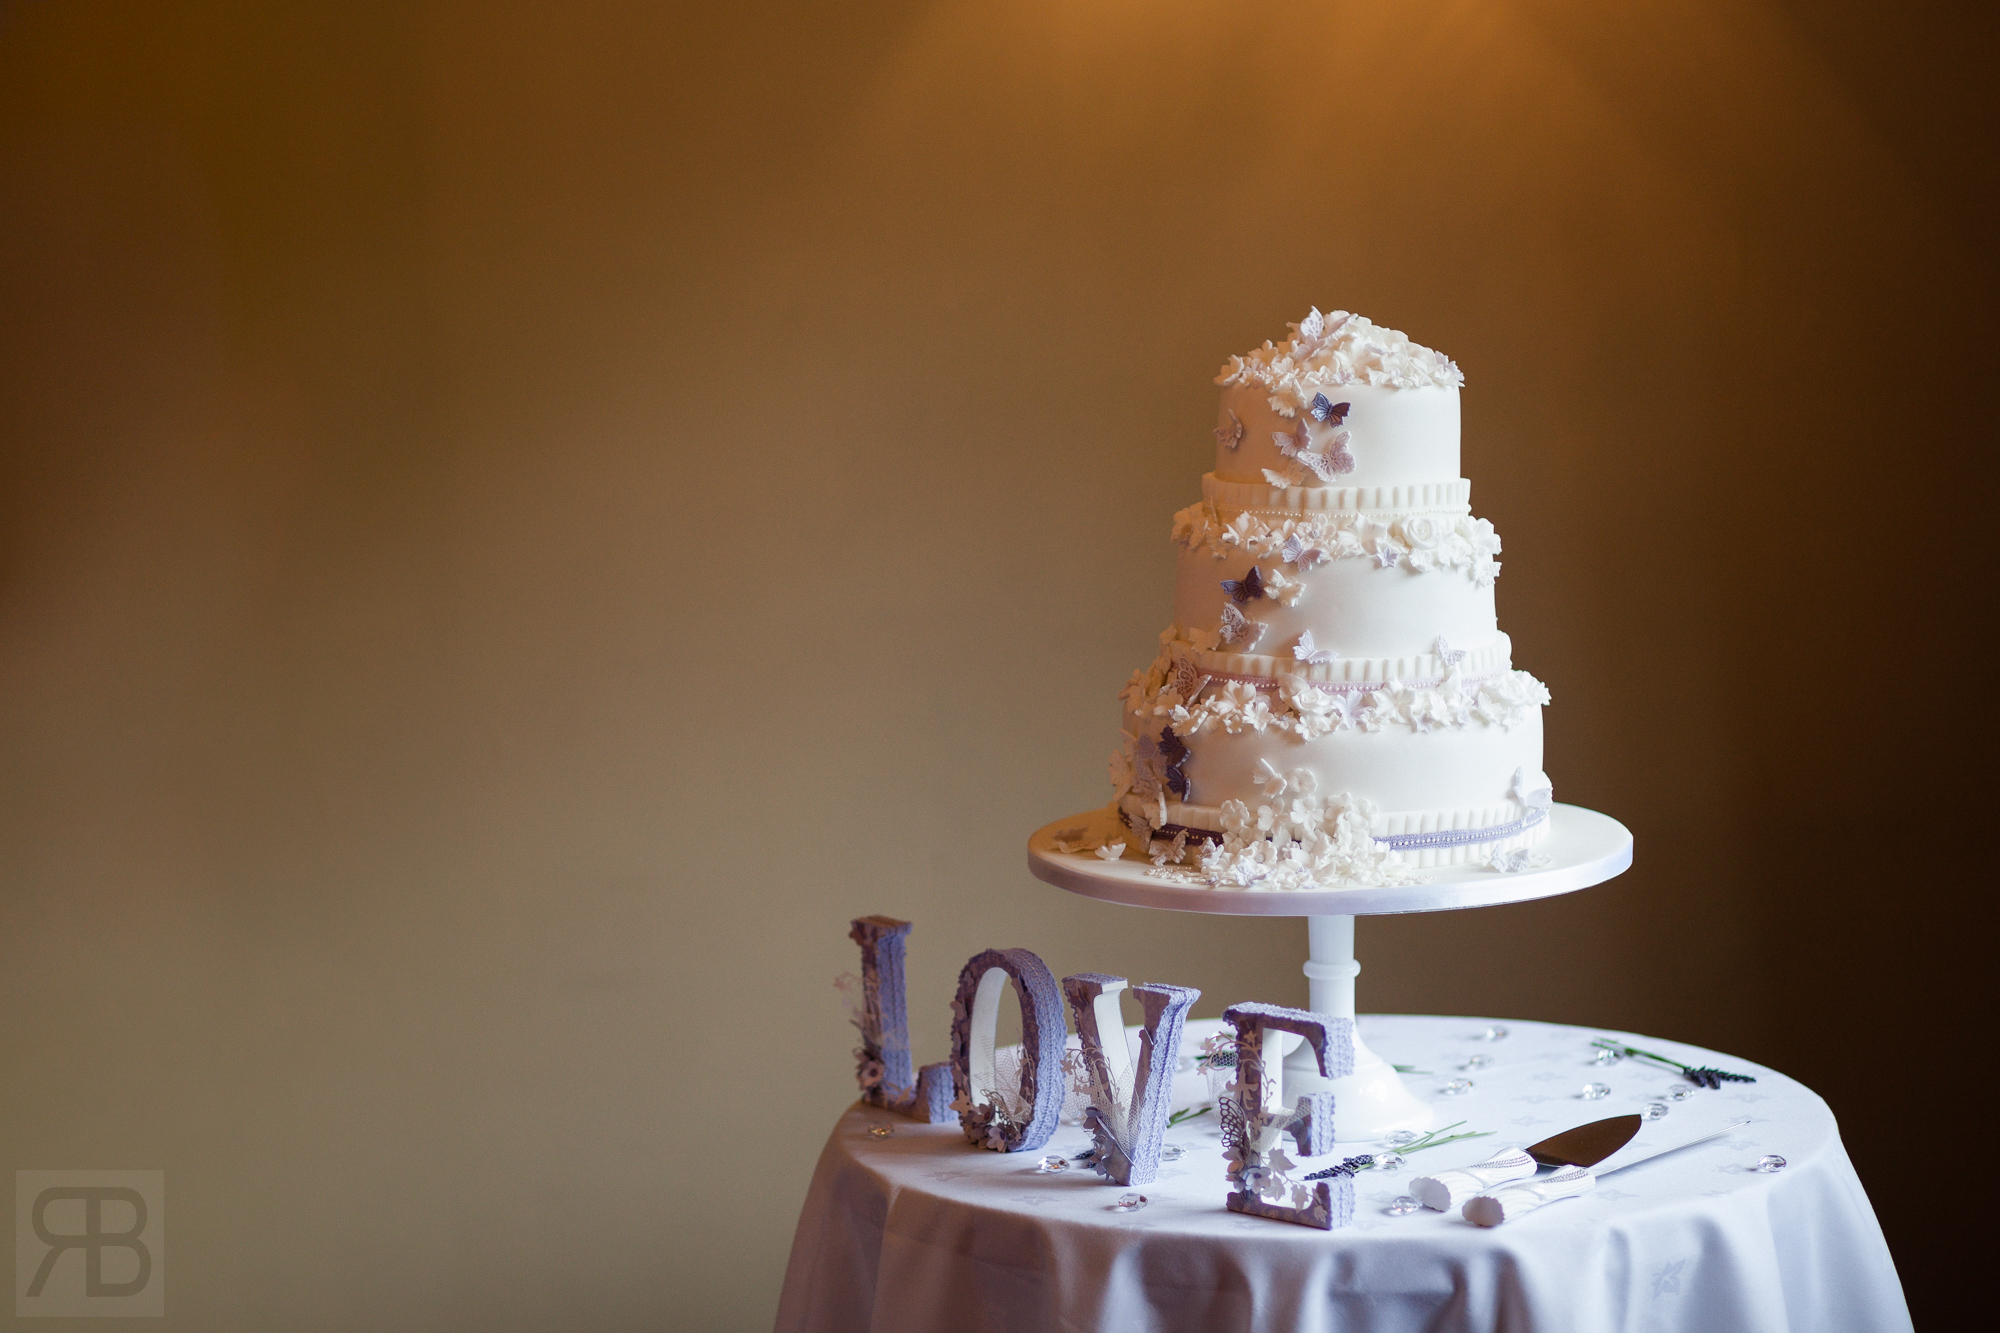 110715_LisaCraigJohnson_Wedding_5433025_WebWM.jpg